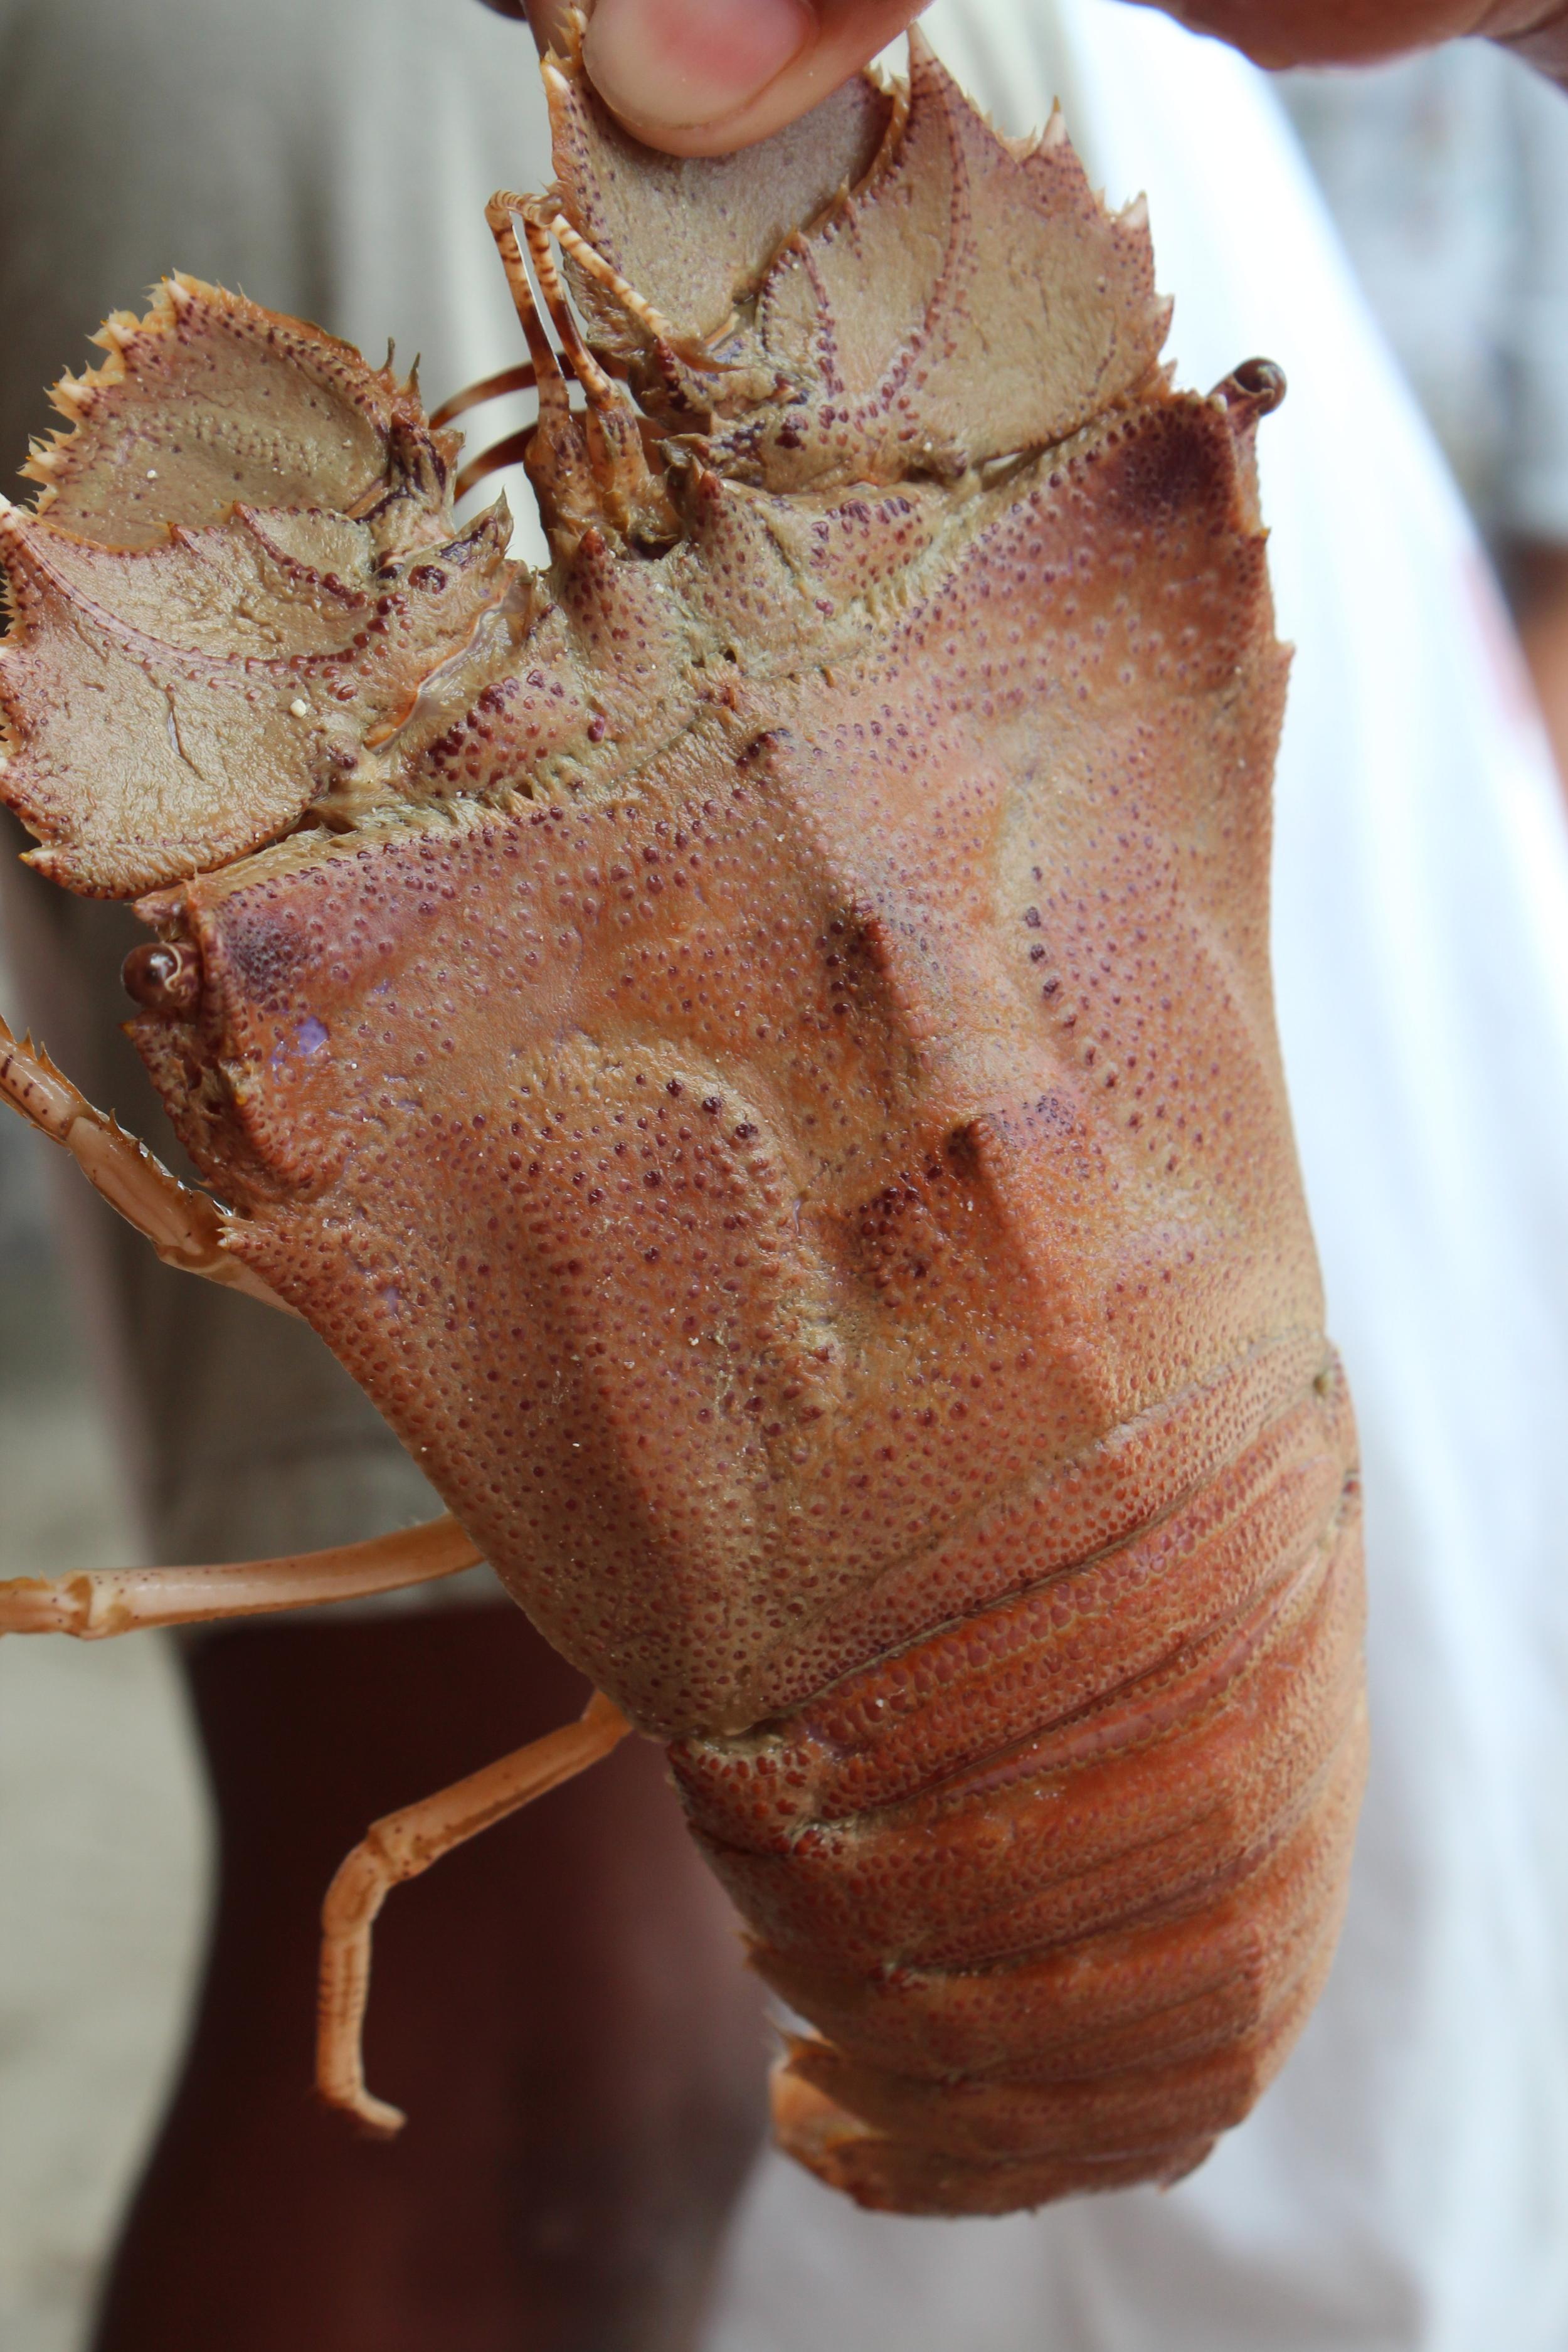 Slipper (tsinelas) lobster, Palawan, Philippines